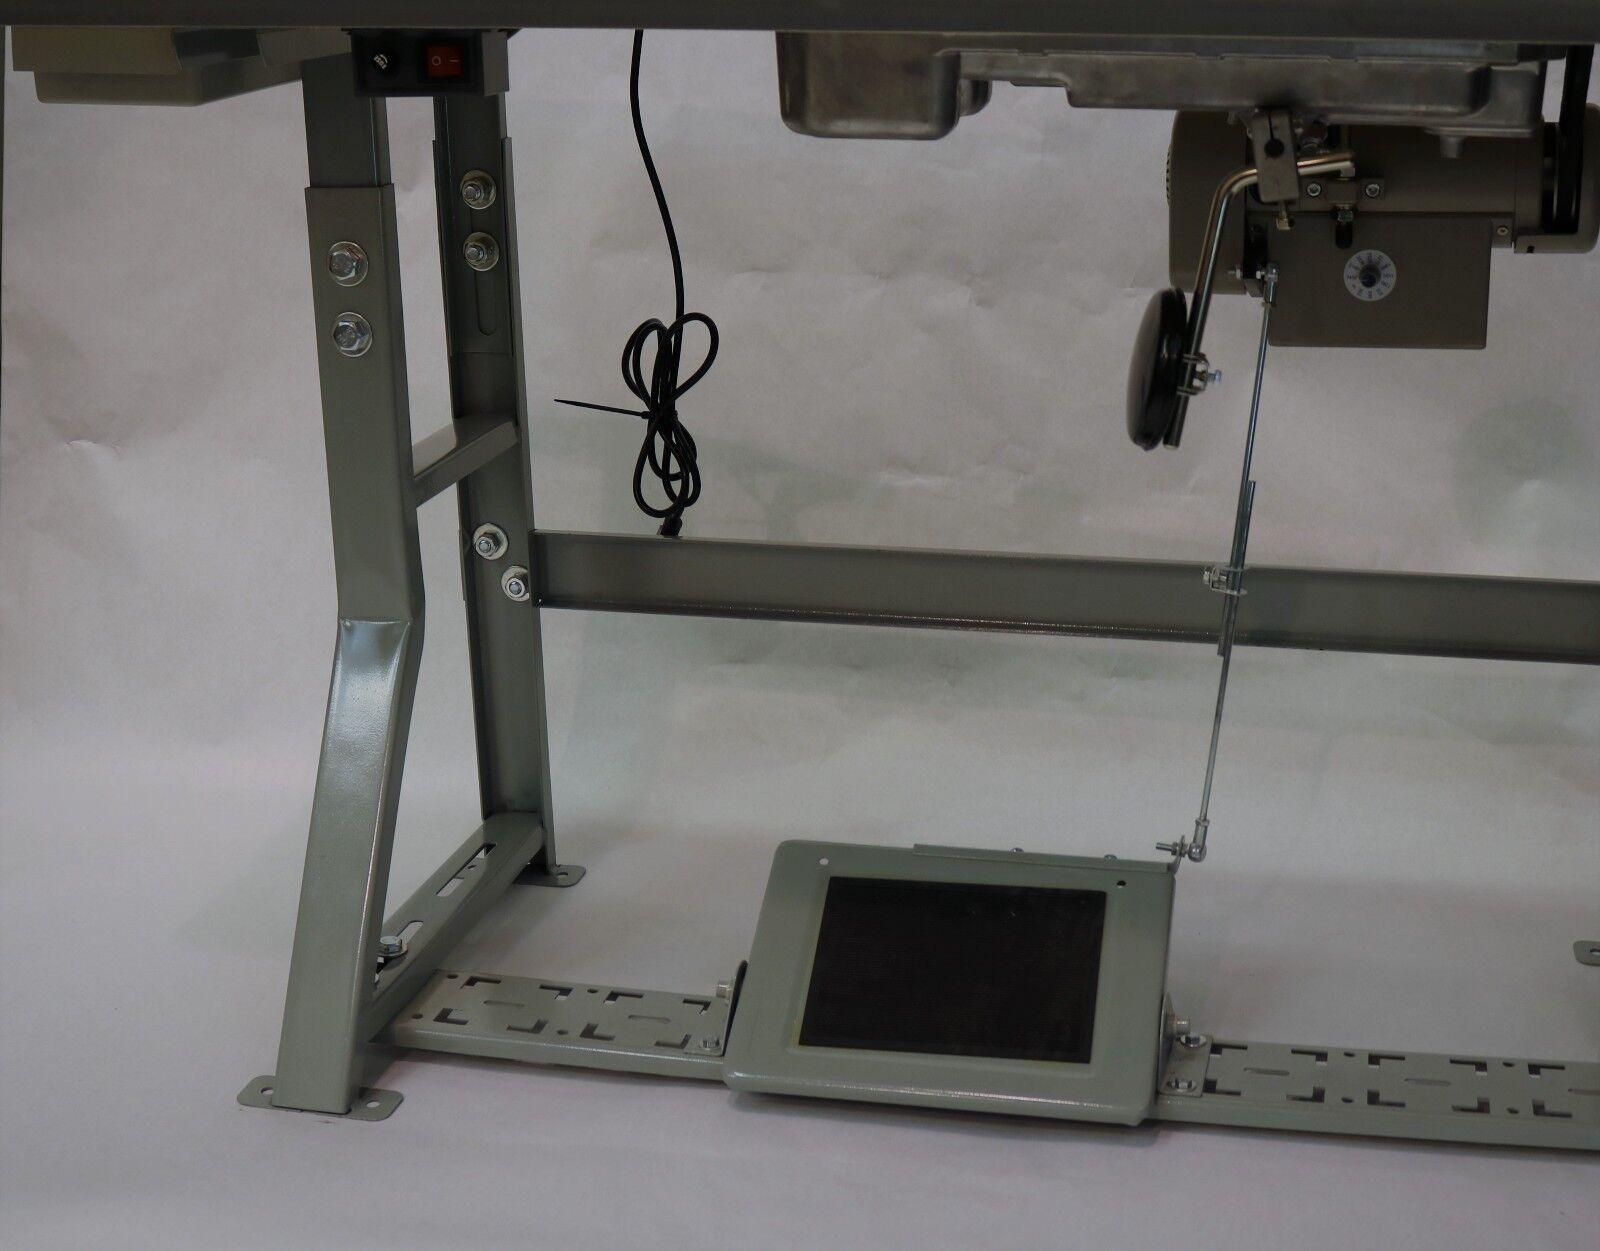 Machine Gun Lamp Car Essay Sam39s Laser Faq Components Html Photos Diagrams And Schematics Headboard